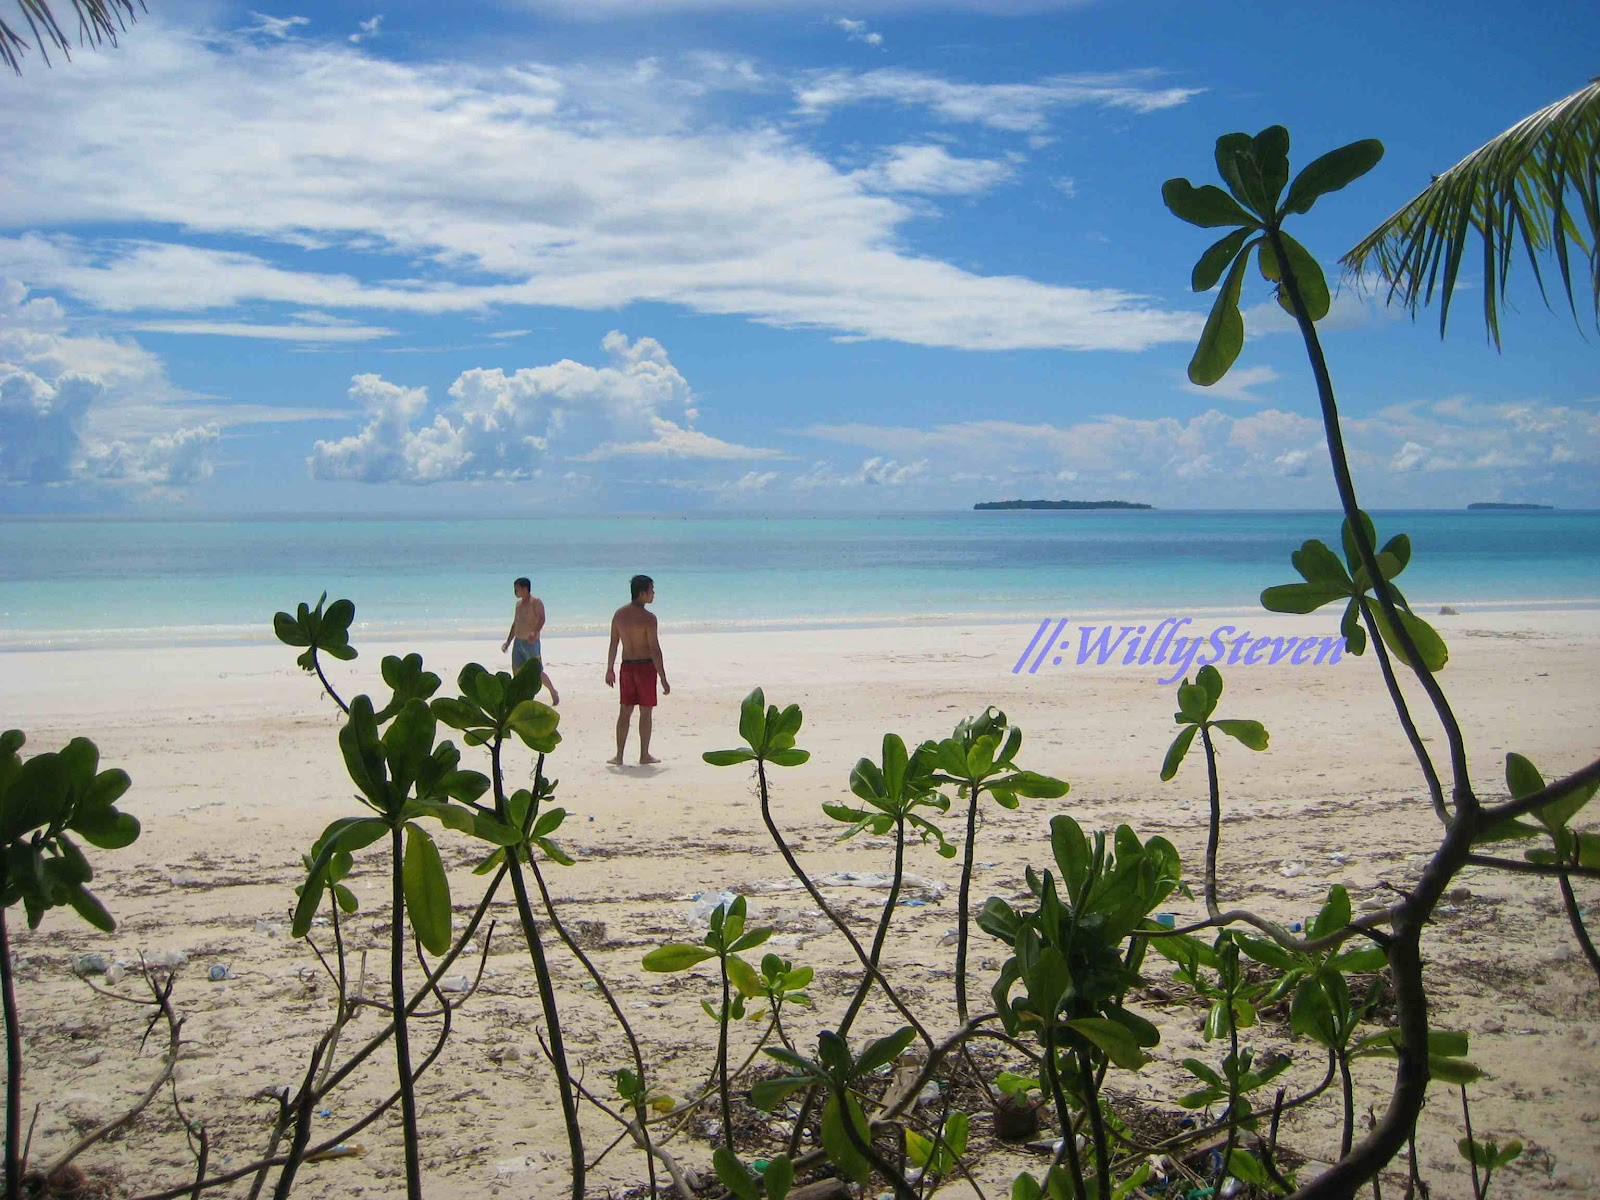 Travellermeds Beauty Beach Maluku Tenggara Pasir Panjang Pulau Kei Kecil